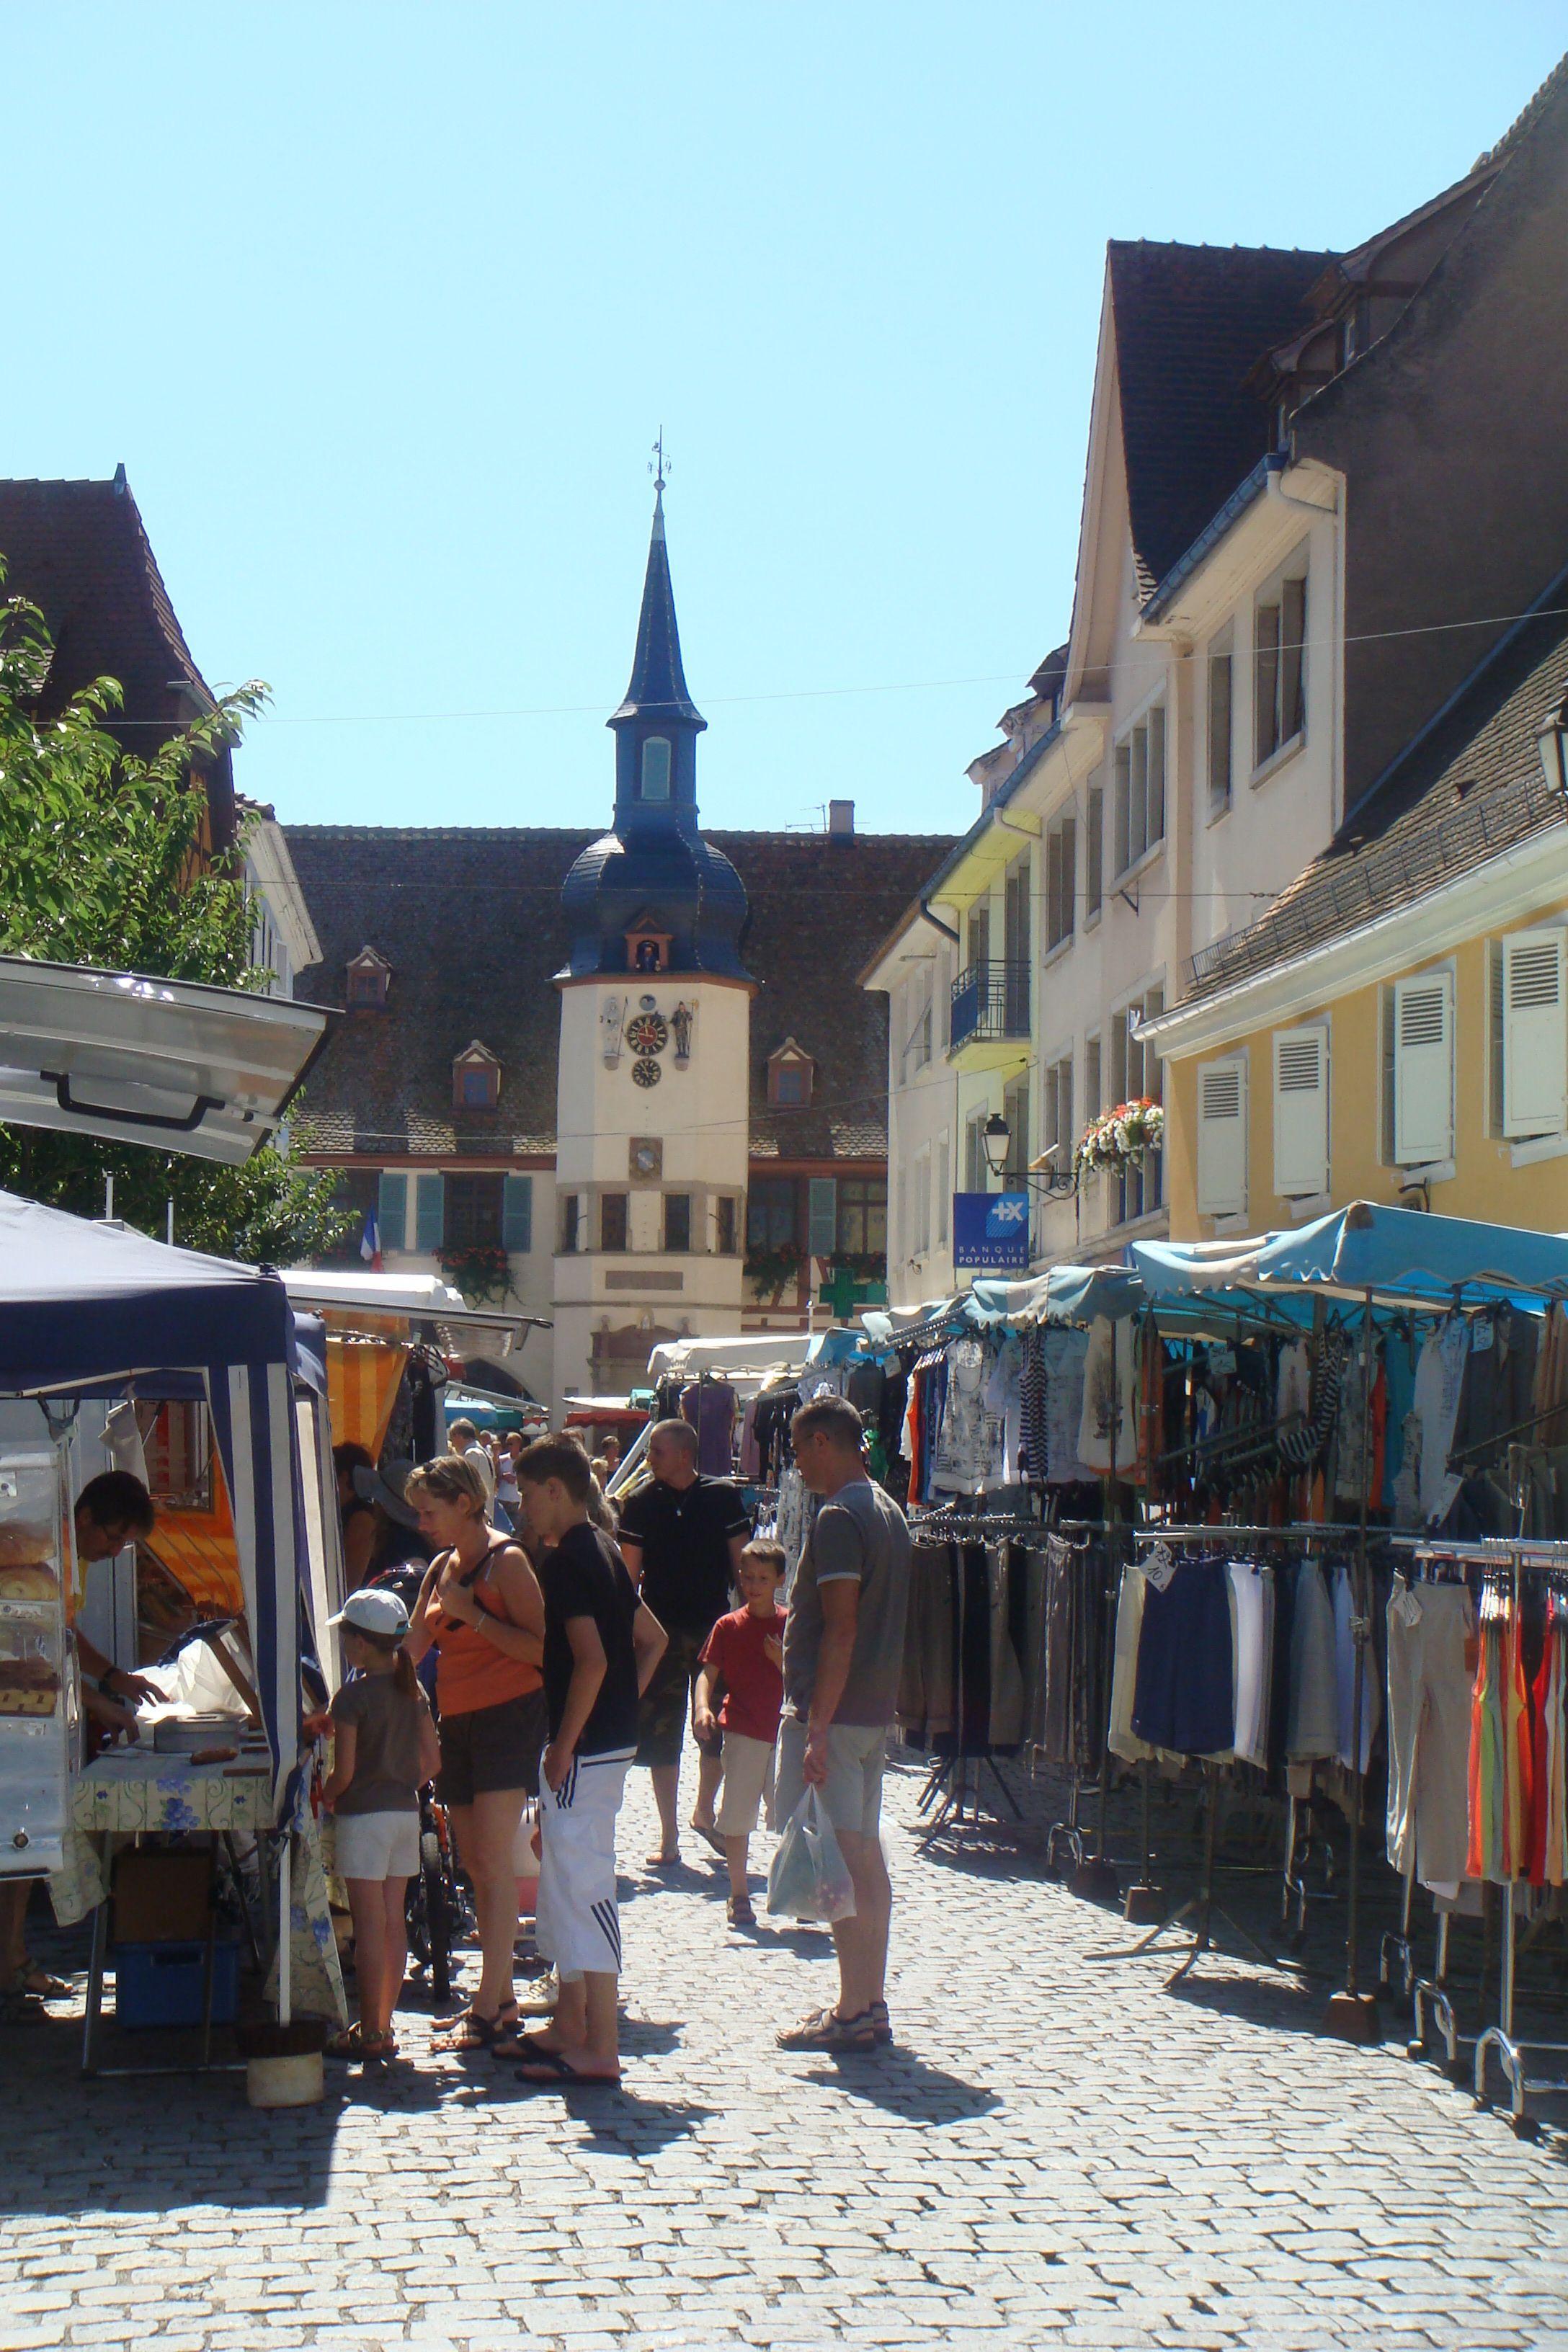 Lundi de Pâques à Benfeld : grand marché